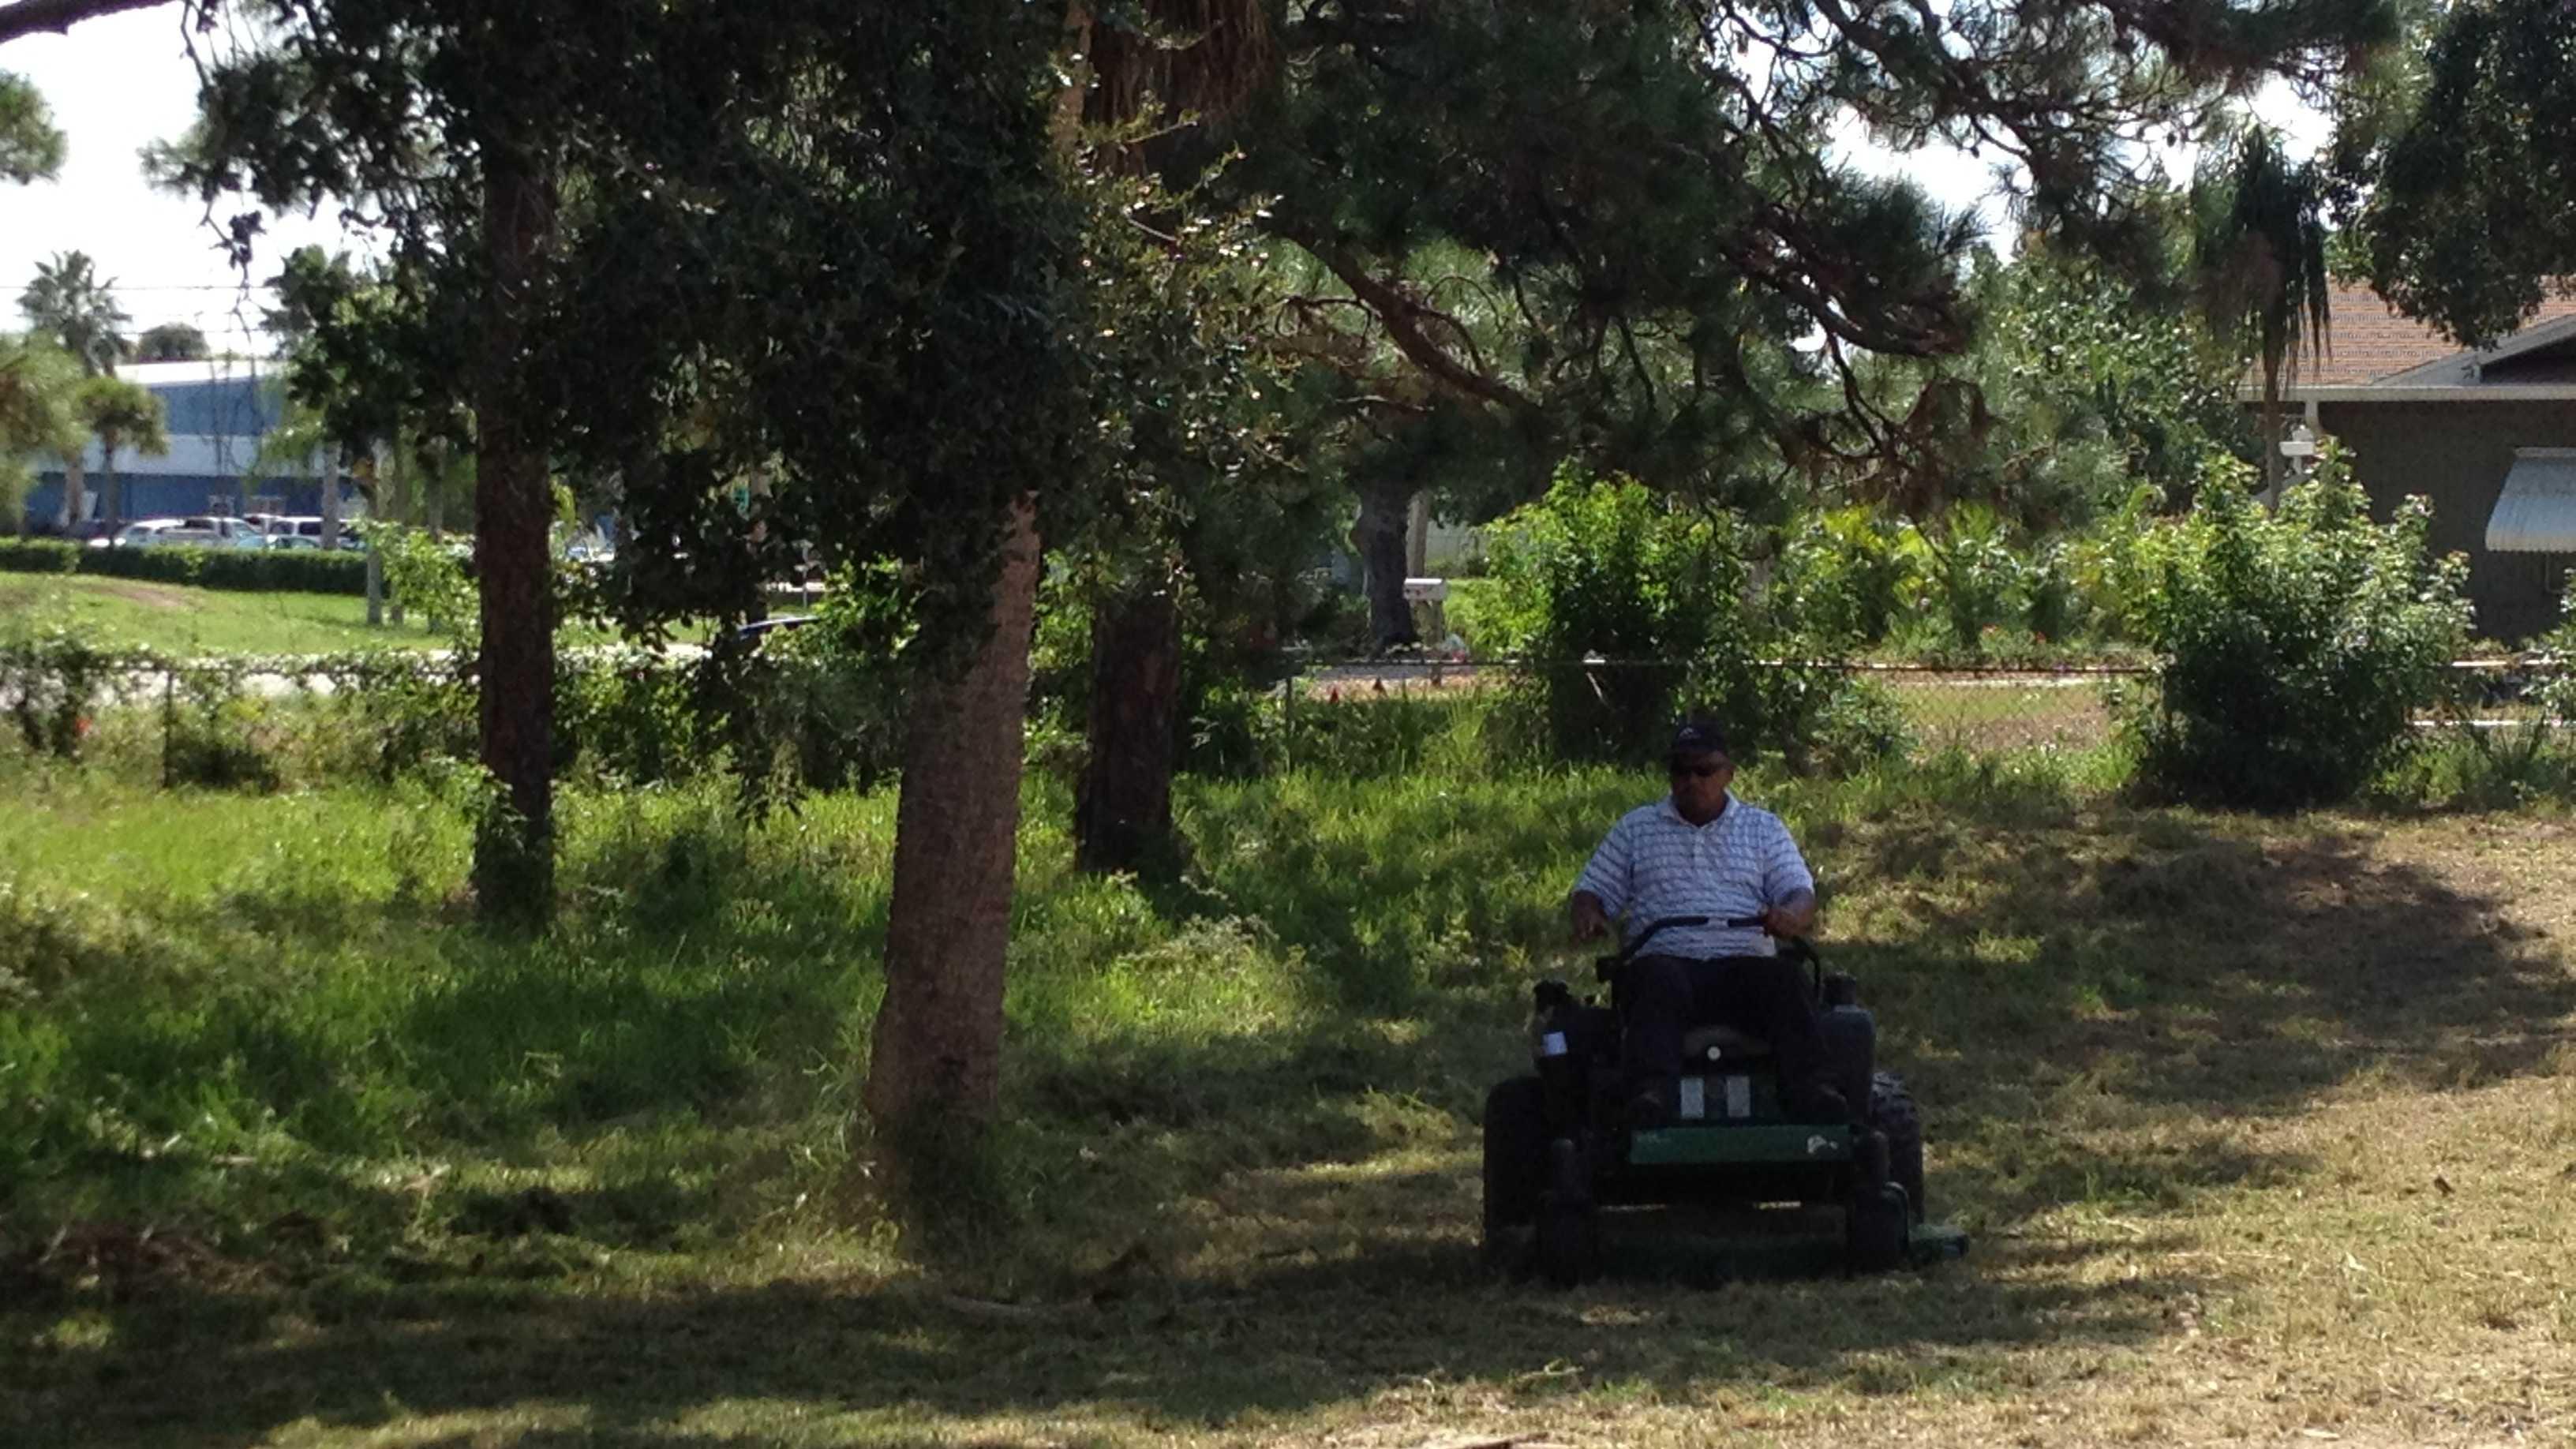 Gary McKinnond is mowing an overgrown cemetery in Vero Beach.